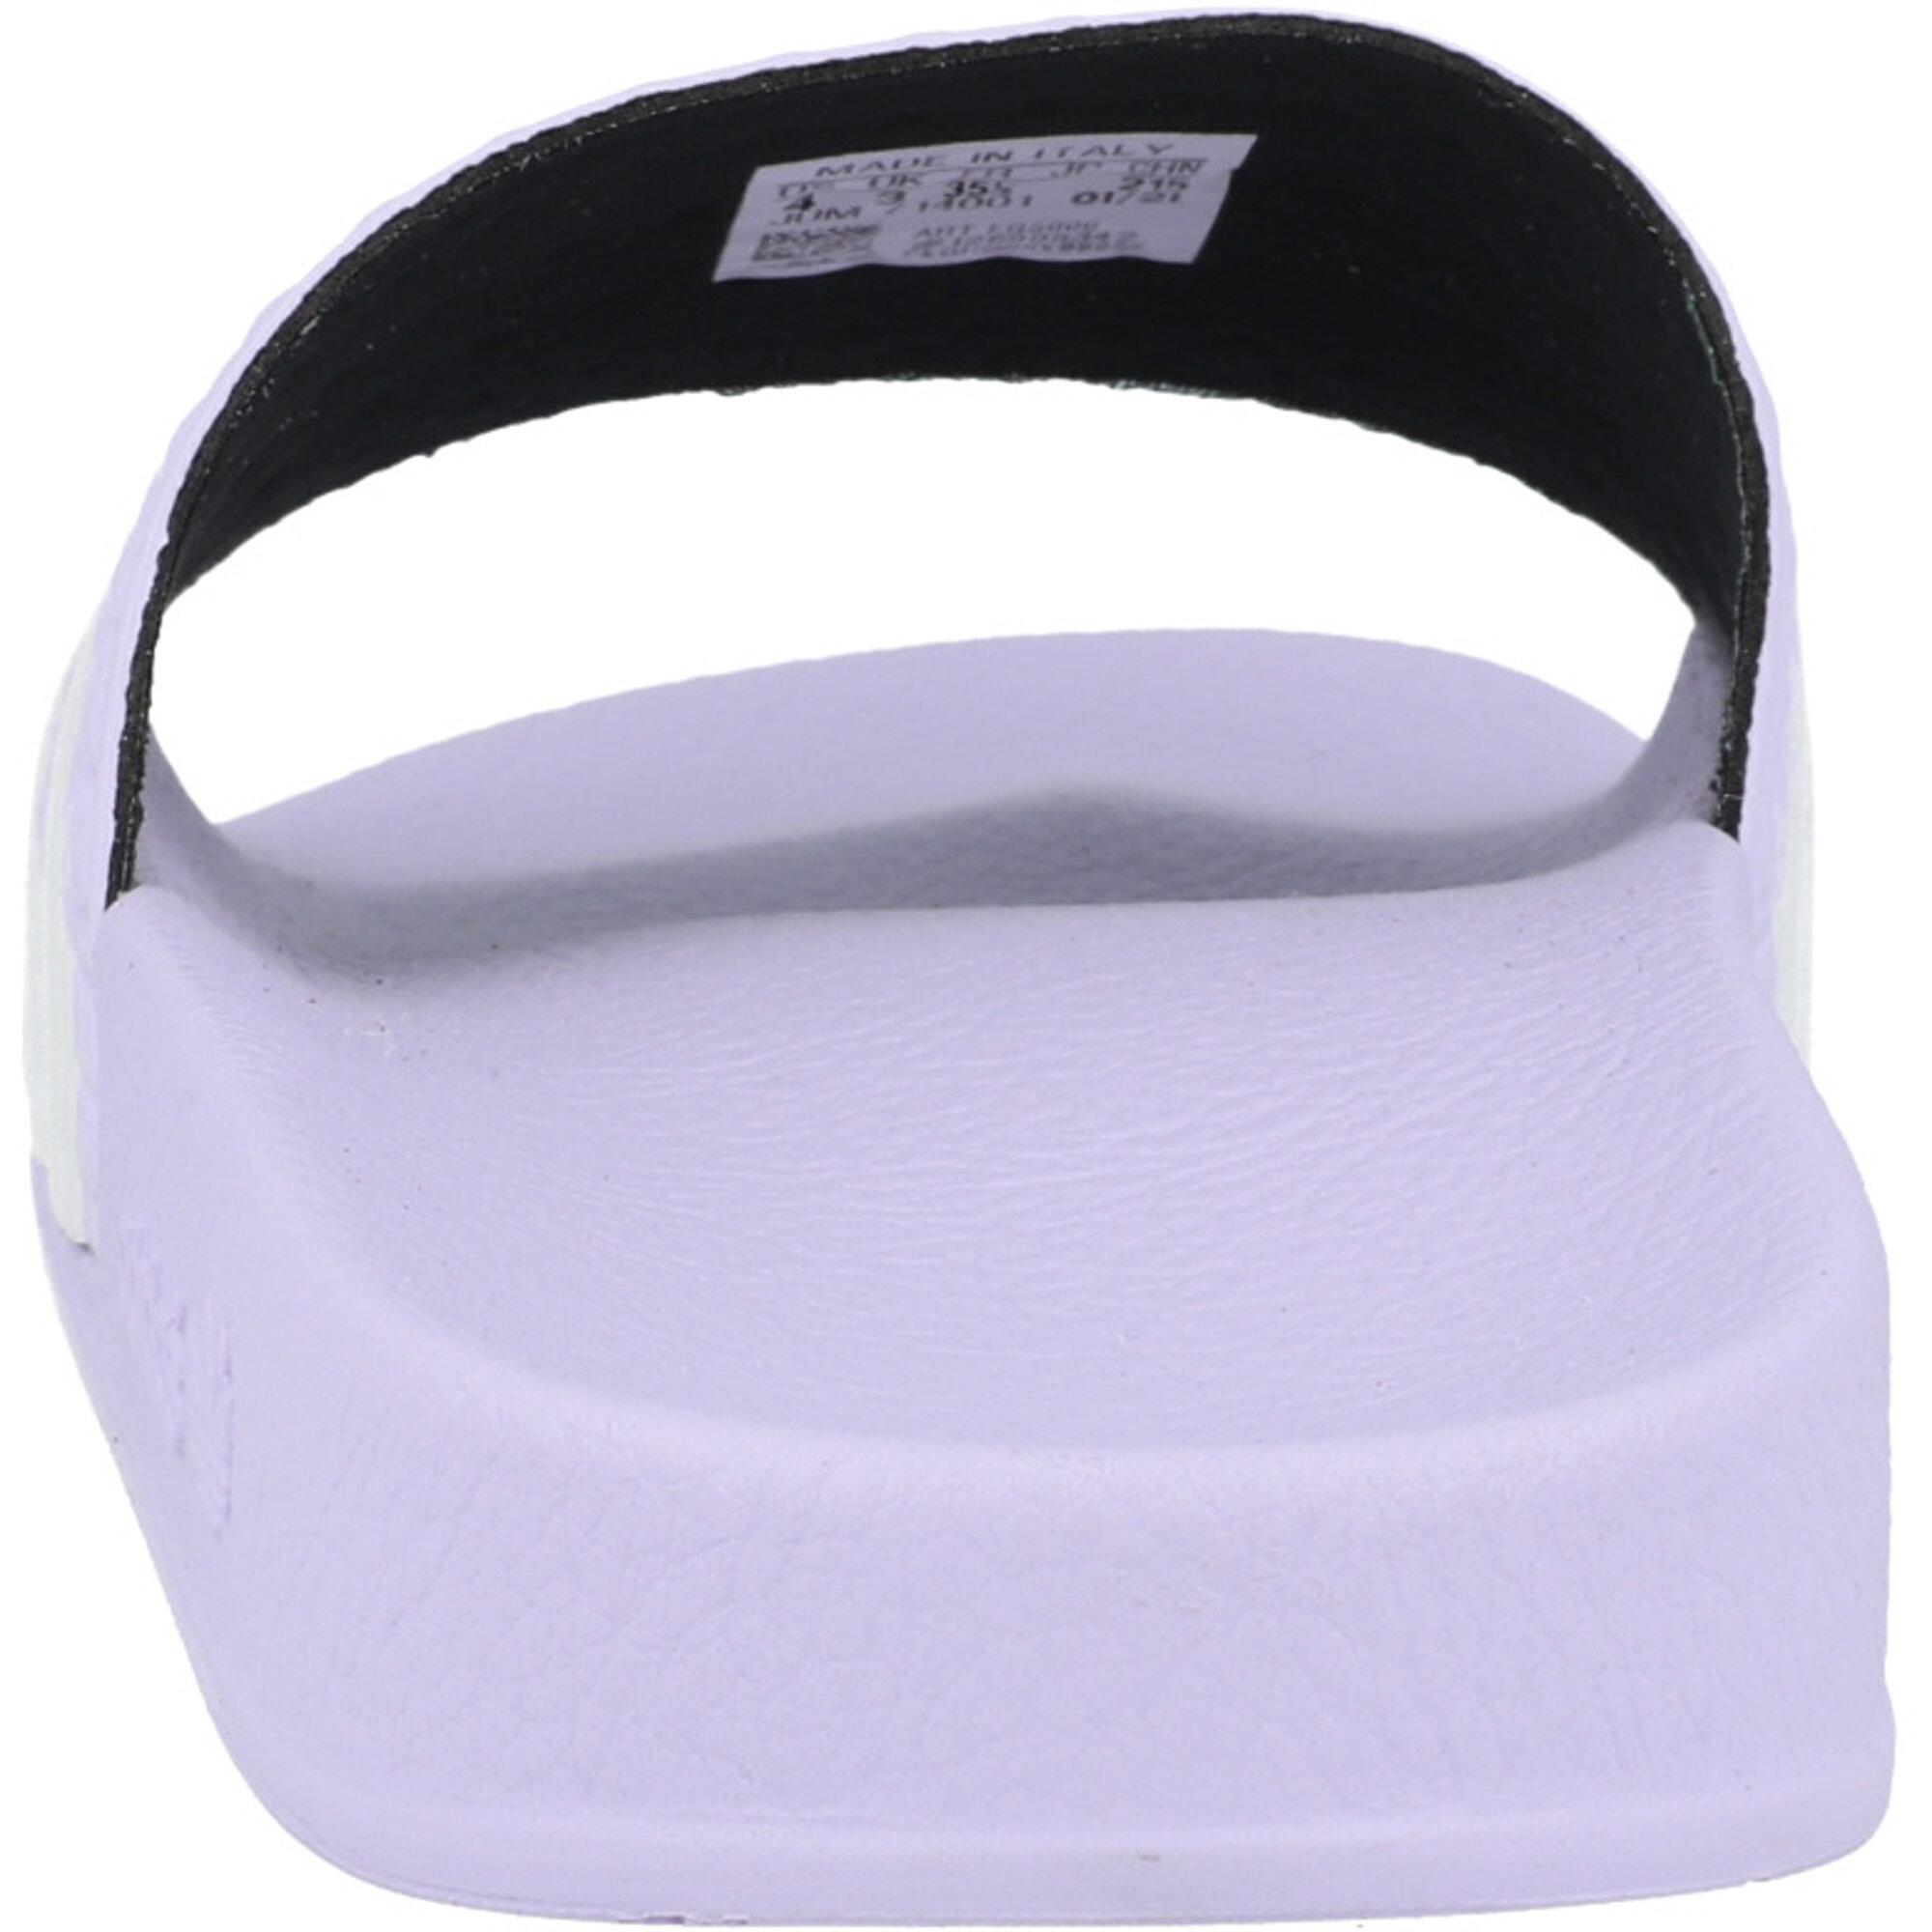 adidas Originals adilette W Purple Tint/White Synthetic